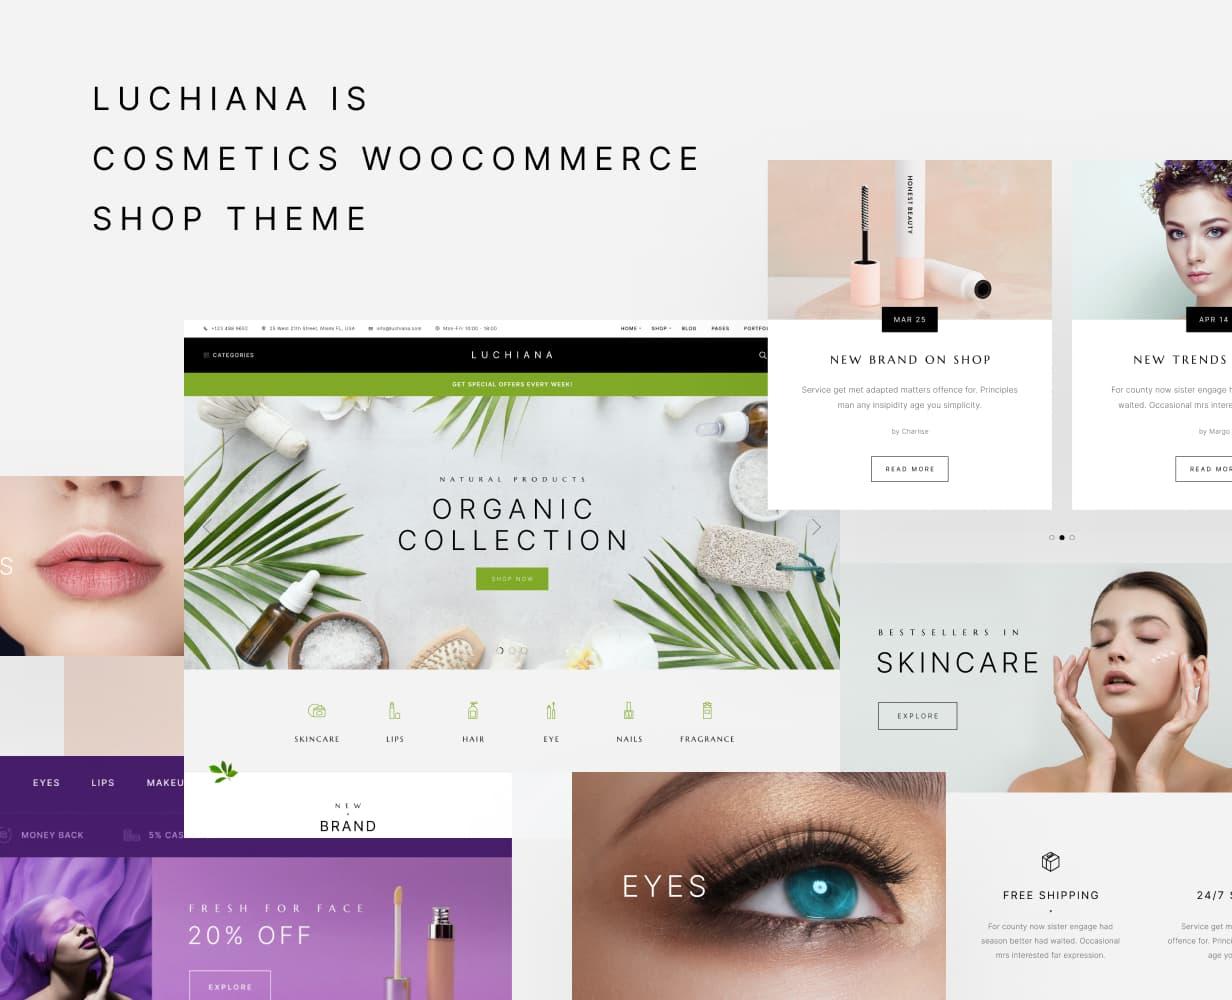 Luchiana - Cosmetics & Beauty Shop WooCoomerce Theme